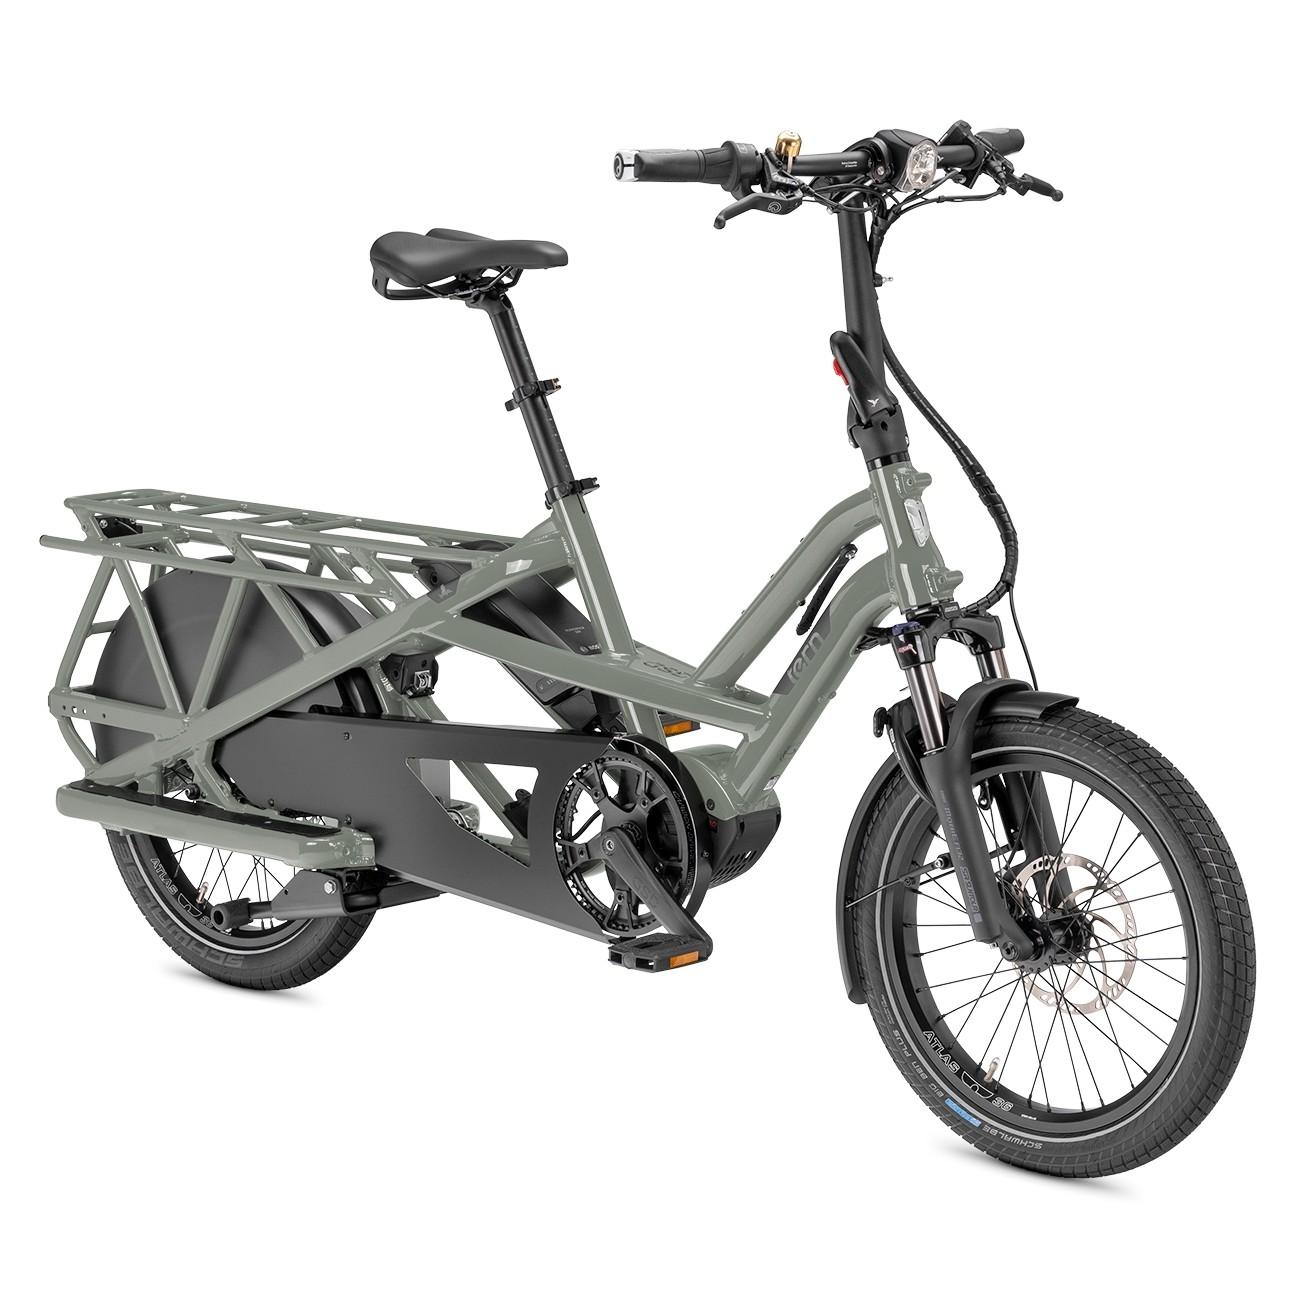 TERN GSD S10 DARK Sage - MY 2021  - Disponible  septembre  2021